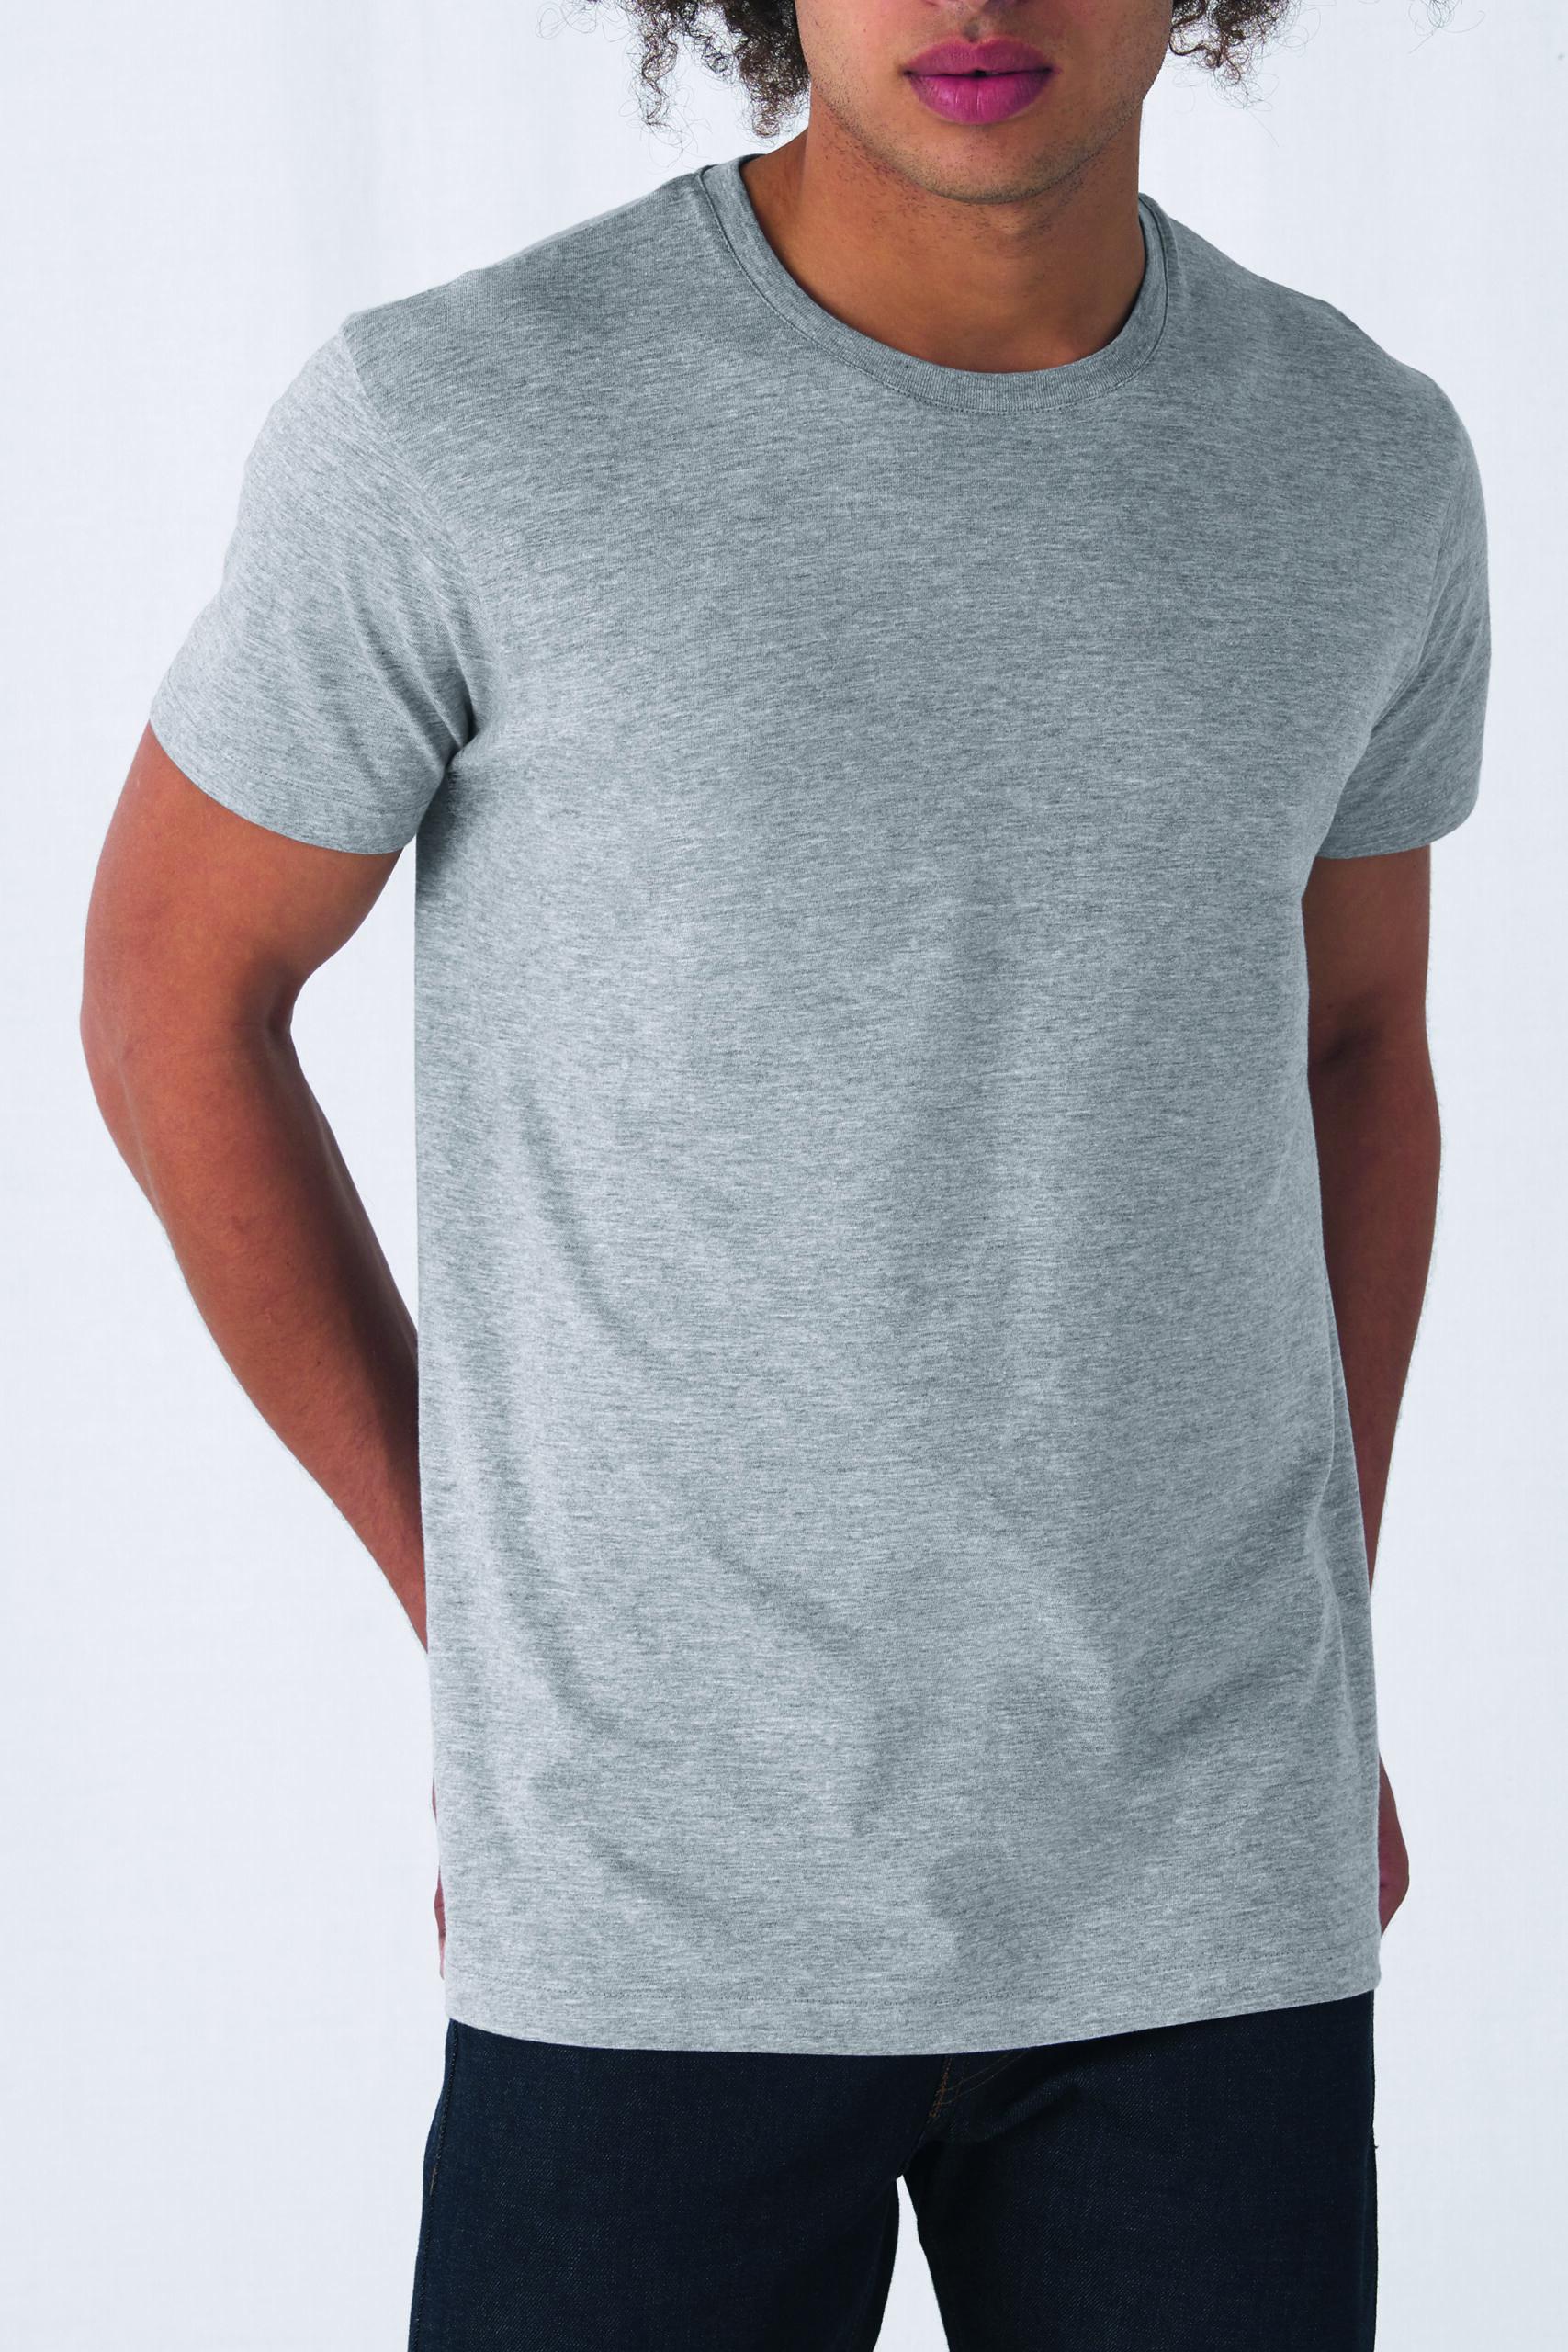 Økologisk, Fair Wear Og Oekotex T-shirt Unisex I En 145g Kvalitet [ BCTU01B]